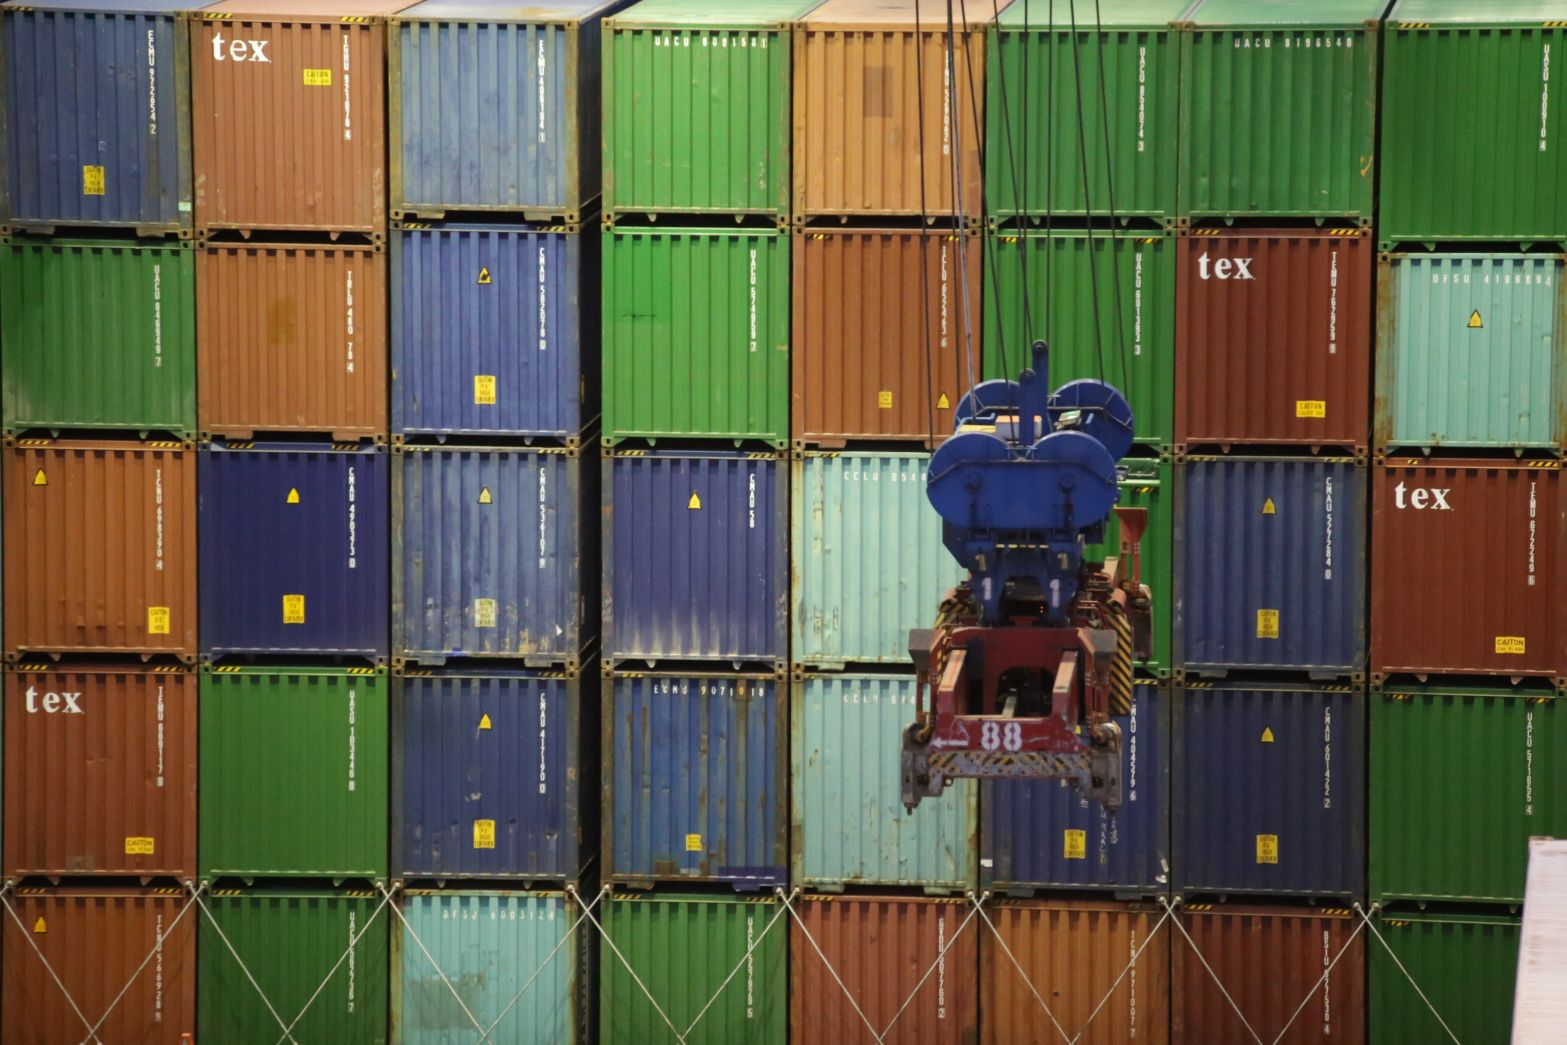 image from SaaS Impact on Logistics Jobs